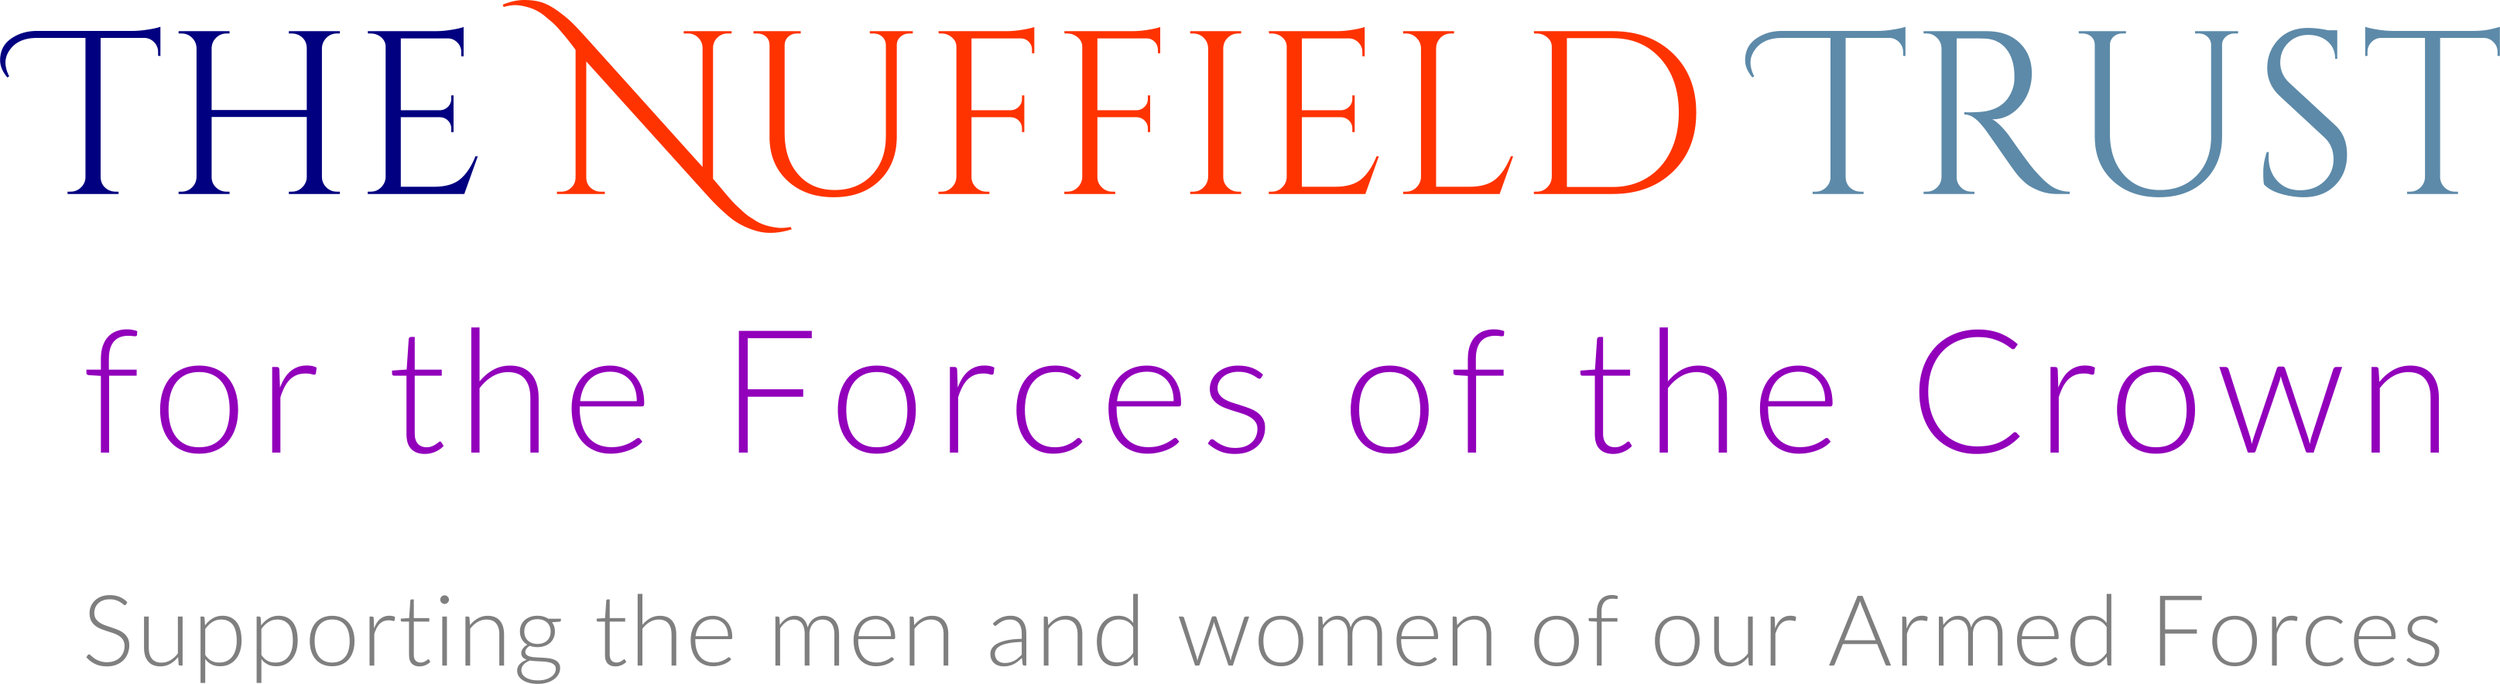 nuffield-trust-logo-large-jpg (002).jpg